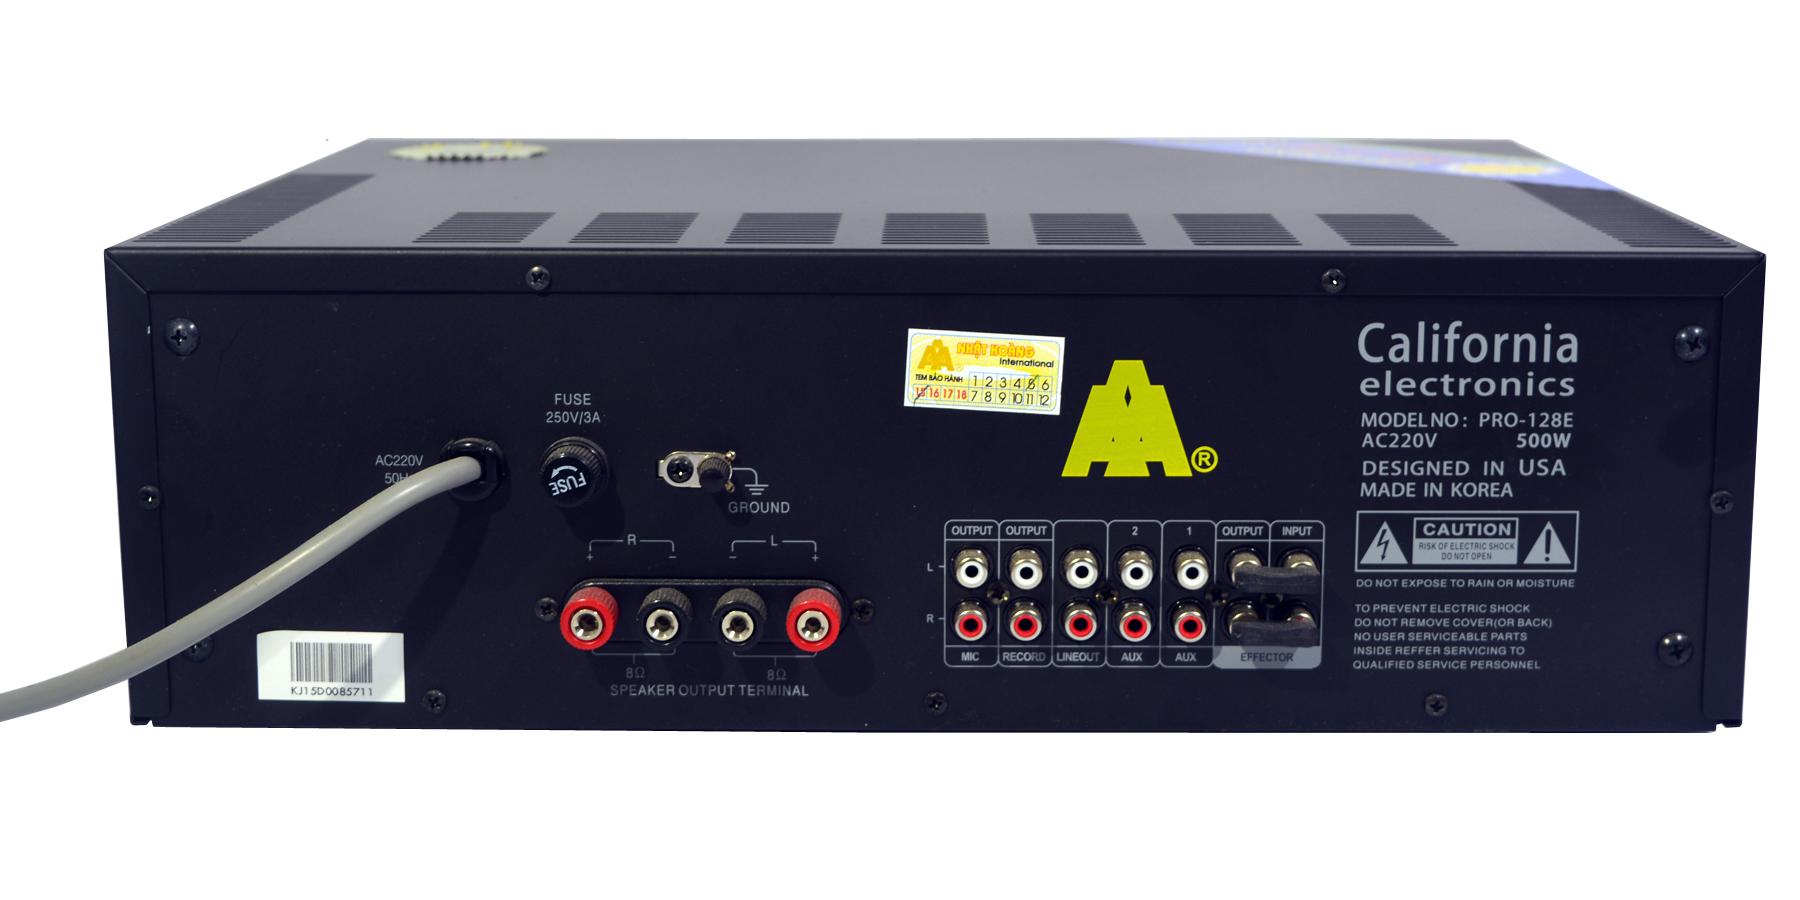 ampli-karaoke-california-pro-128e-3(3)